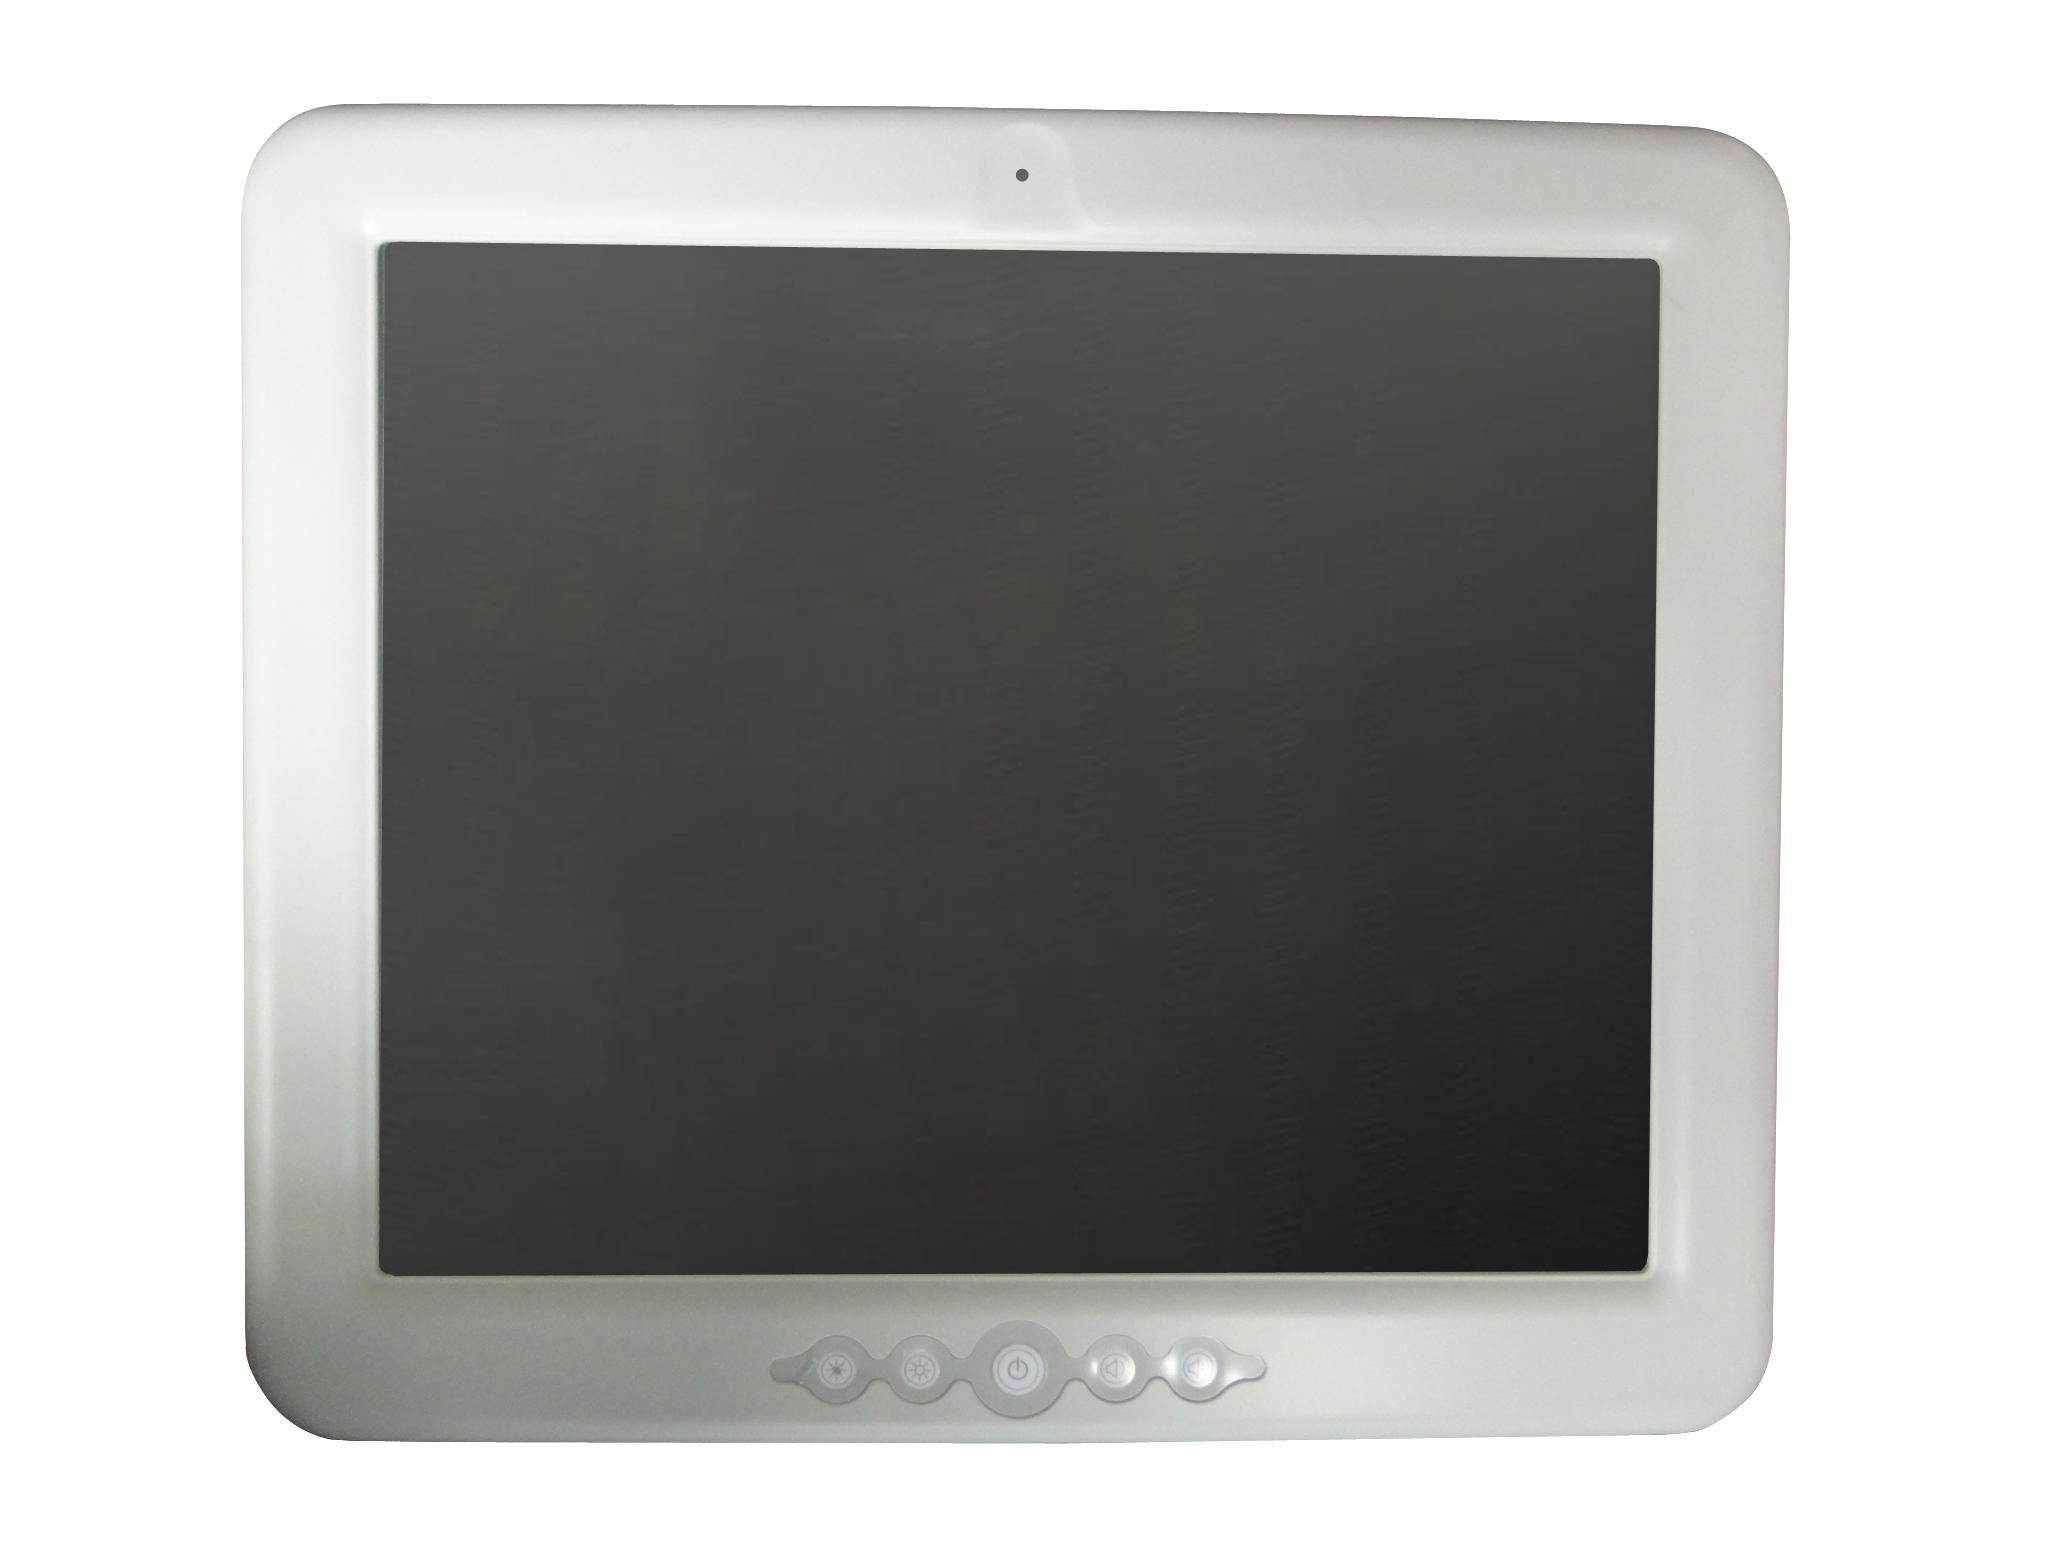 proimages/news/Product_news/2012/20121009-1.jpg